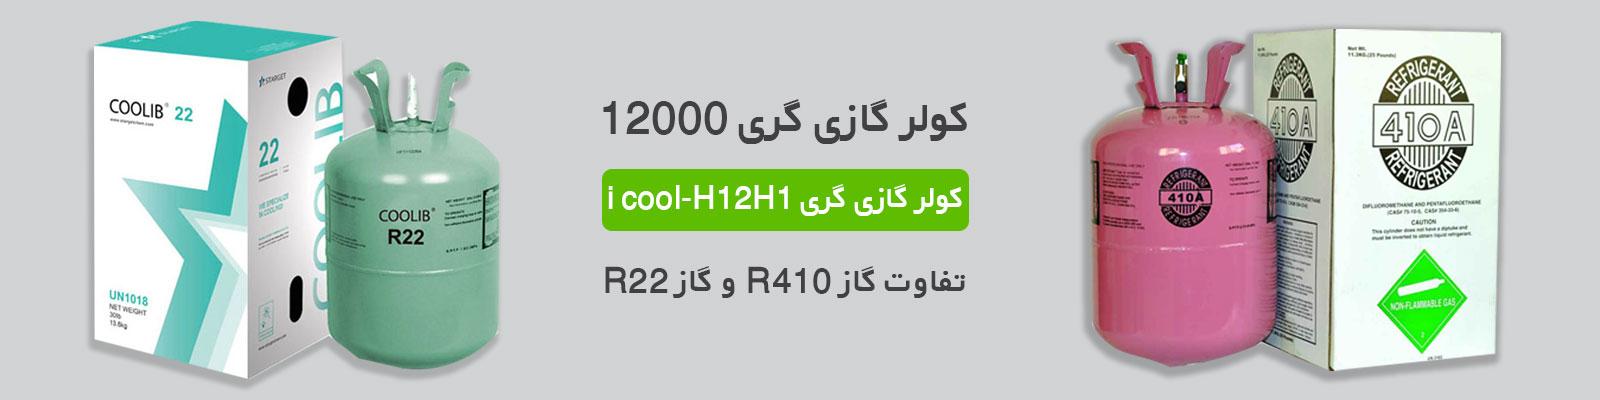 گری icool-h12h1 گاز کولر گازی آی کول 12000